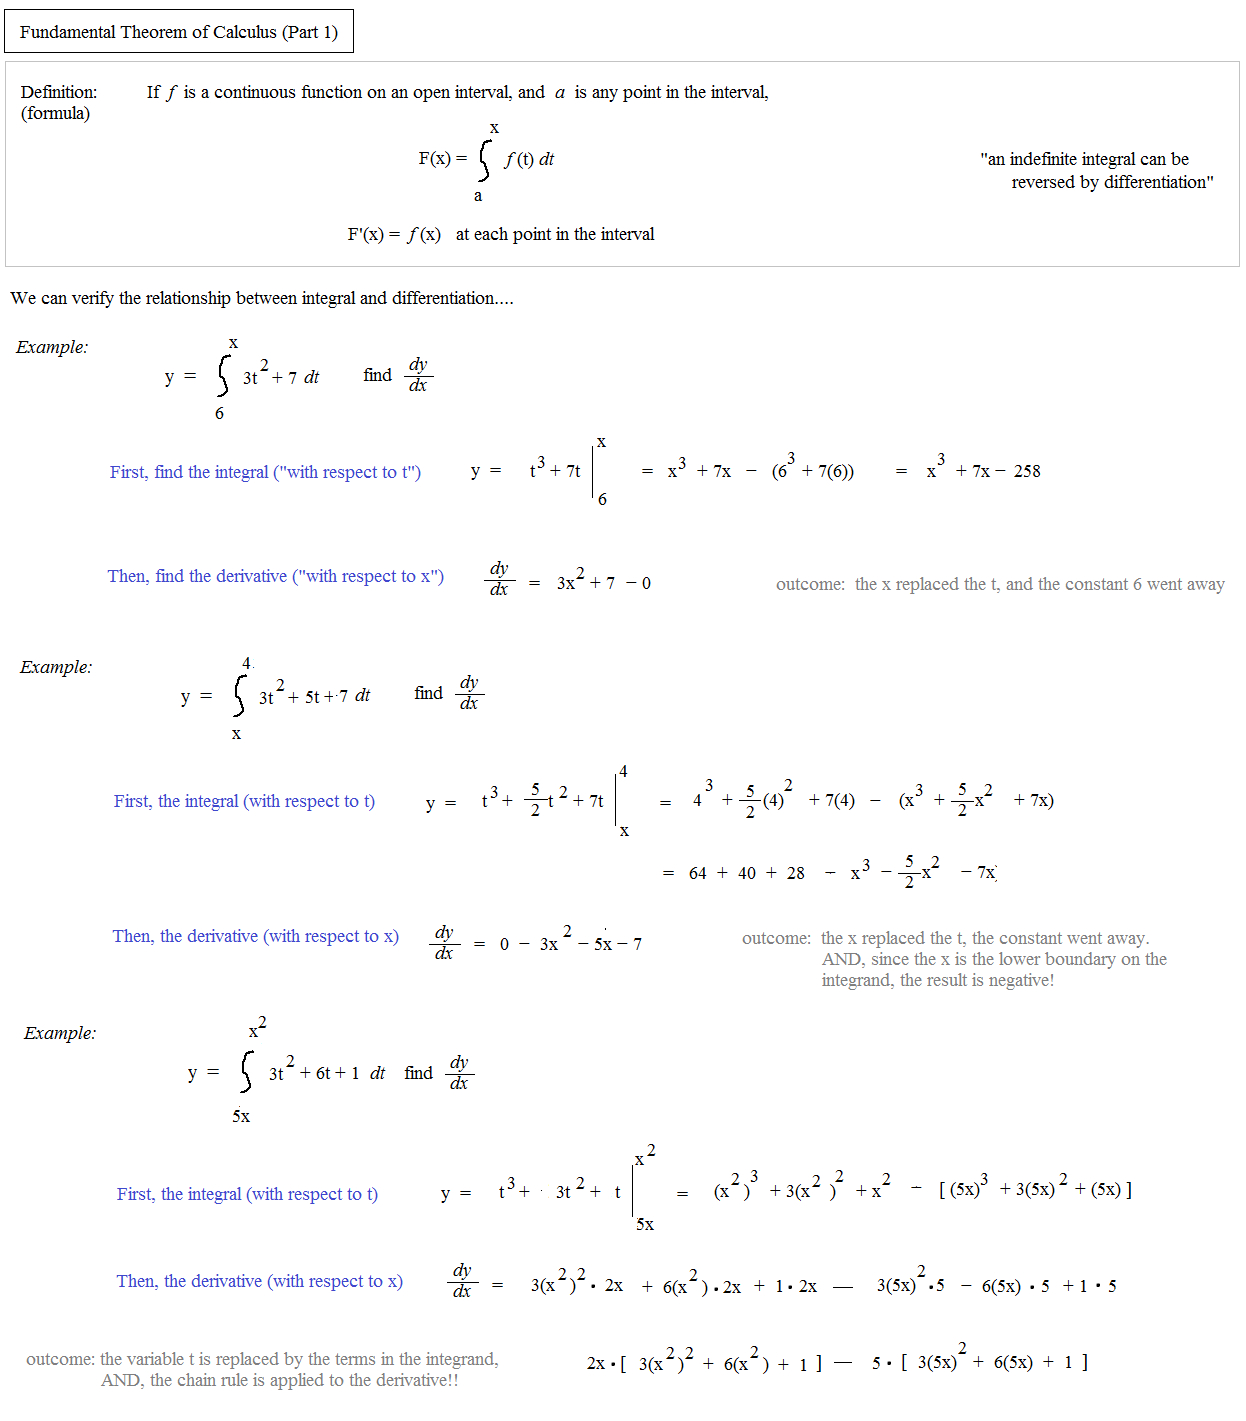 Math Plane  Fundamental Theorem Of Calculus Part 1 And Fundamental Theorem Of Algebra Worksheet Answers